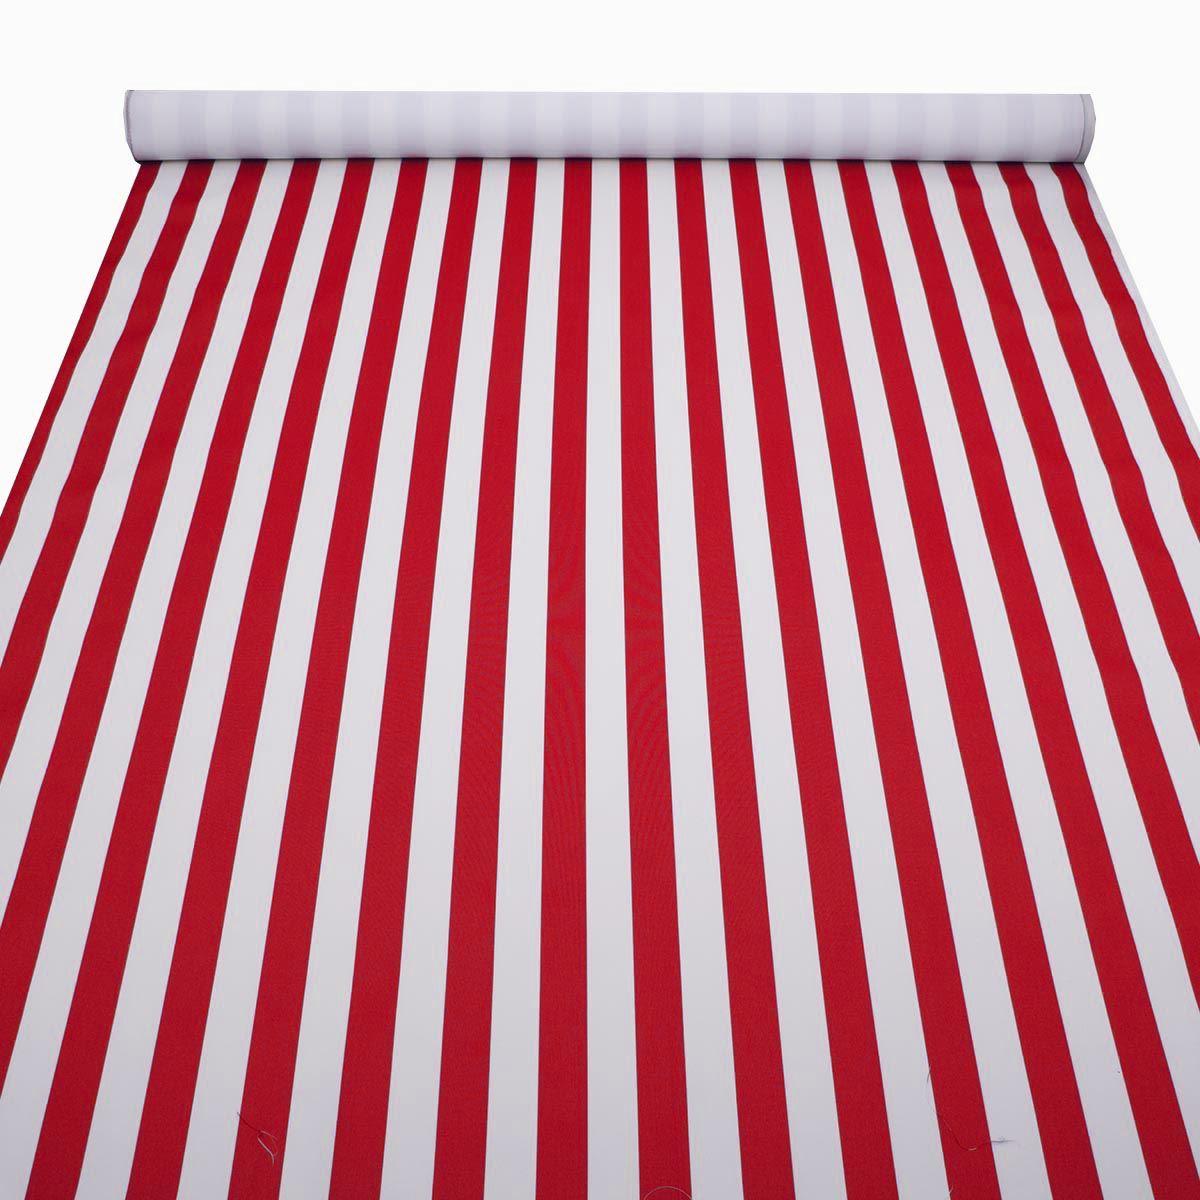 heavy duty canvas stripe deck chair range blue white red. Black Bedroom Furniture Sets. Home Design Ideas